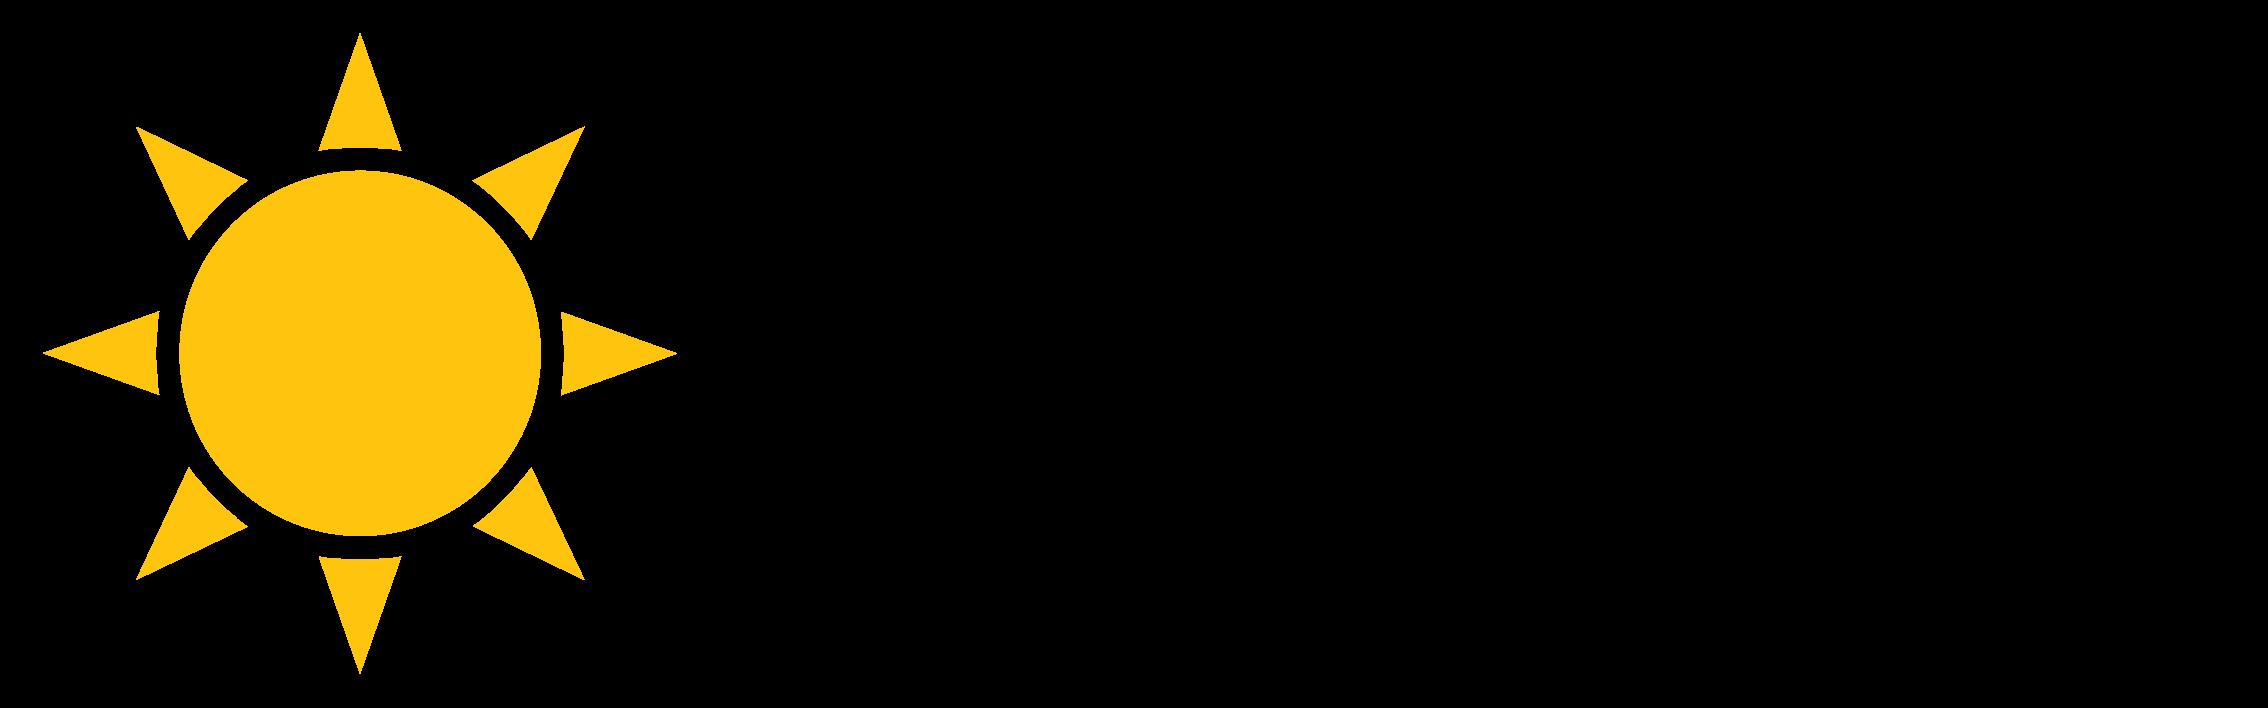 006-CNSF-Logo-Color.png